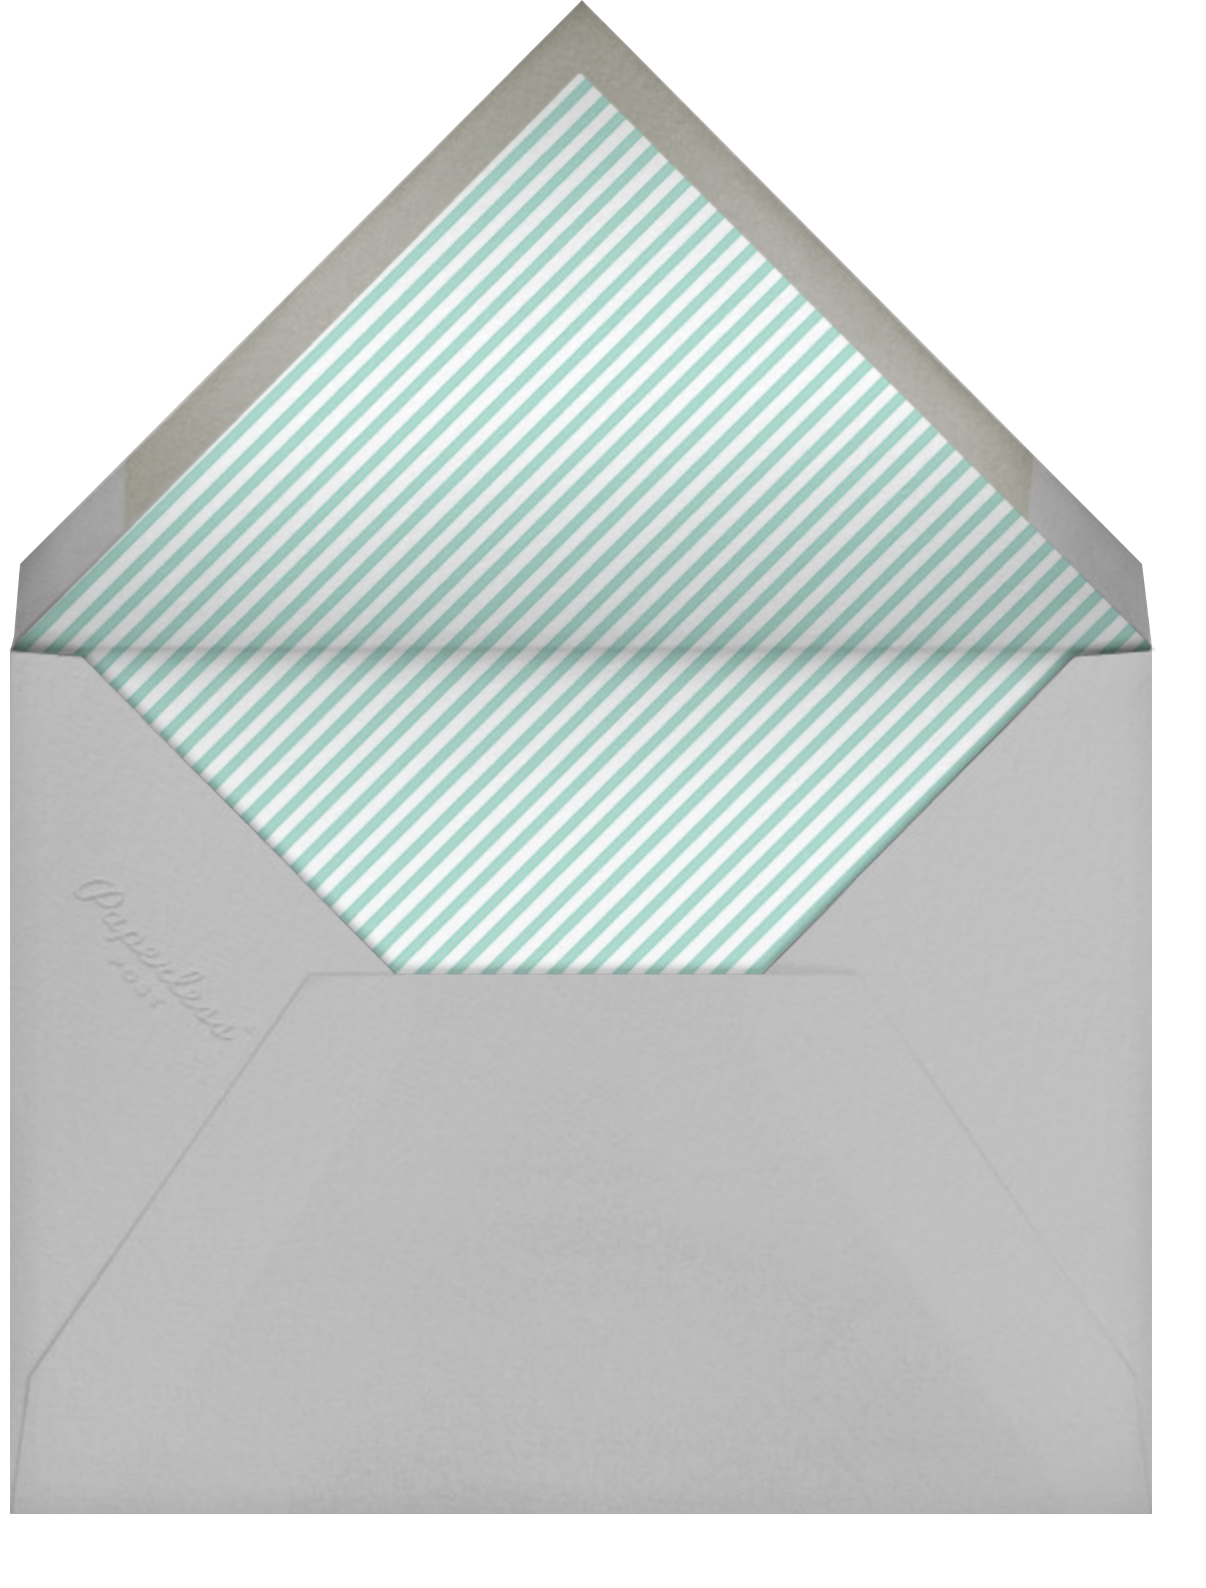 Birdie Makes A Wreath - Little Cube - Woodland baby shower - envelope back